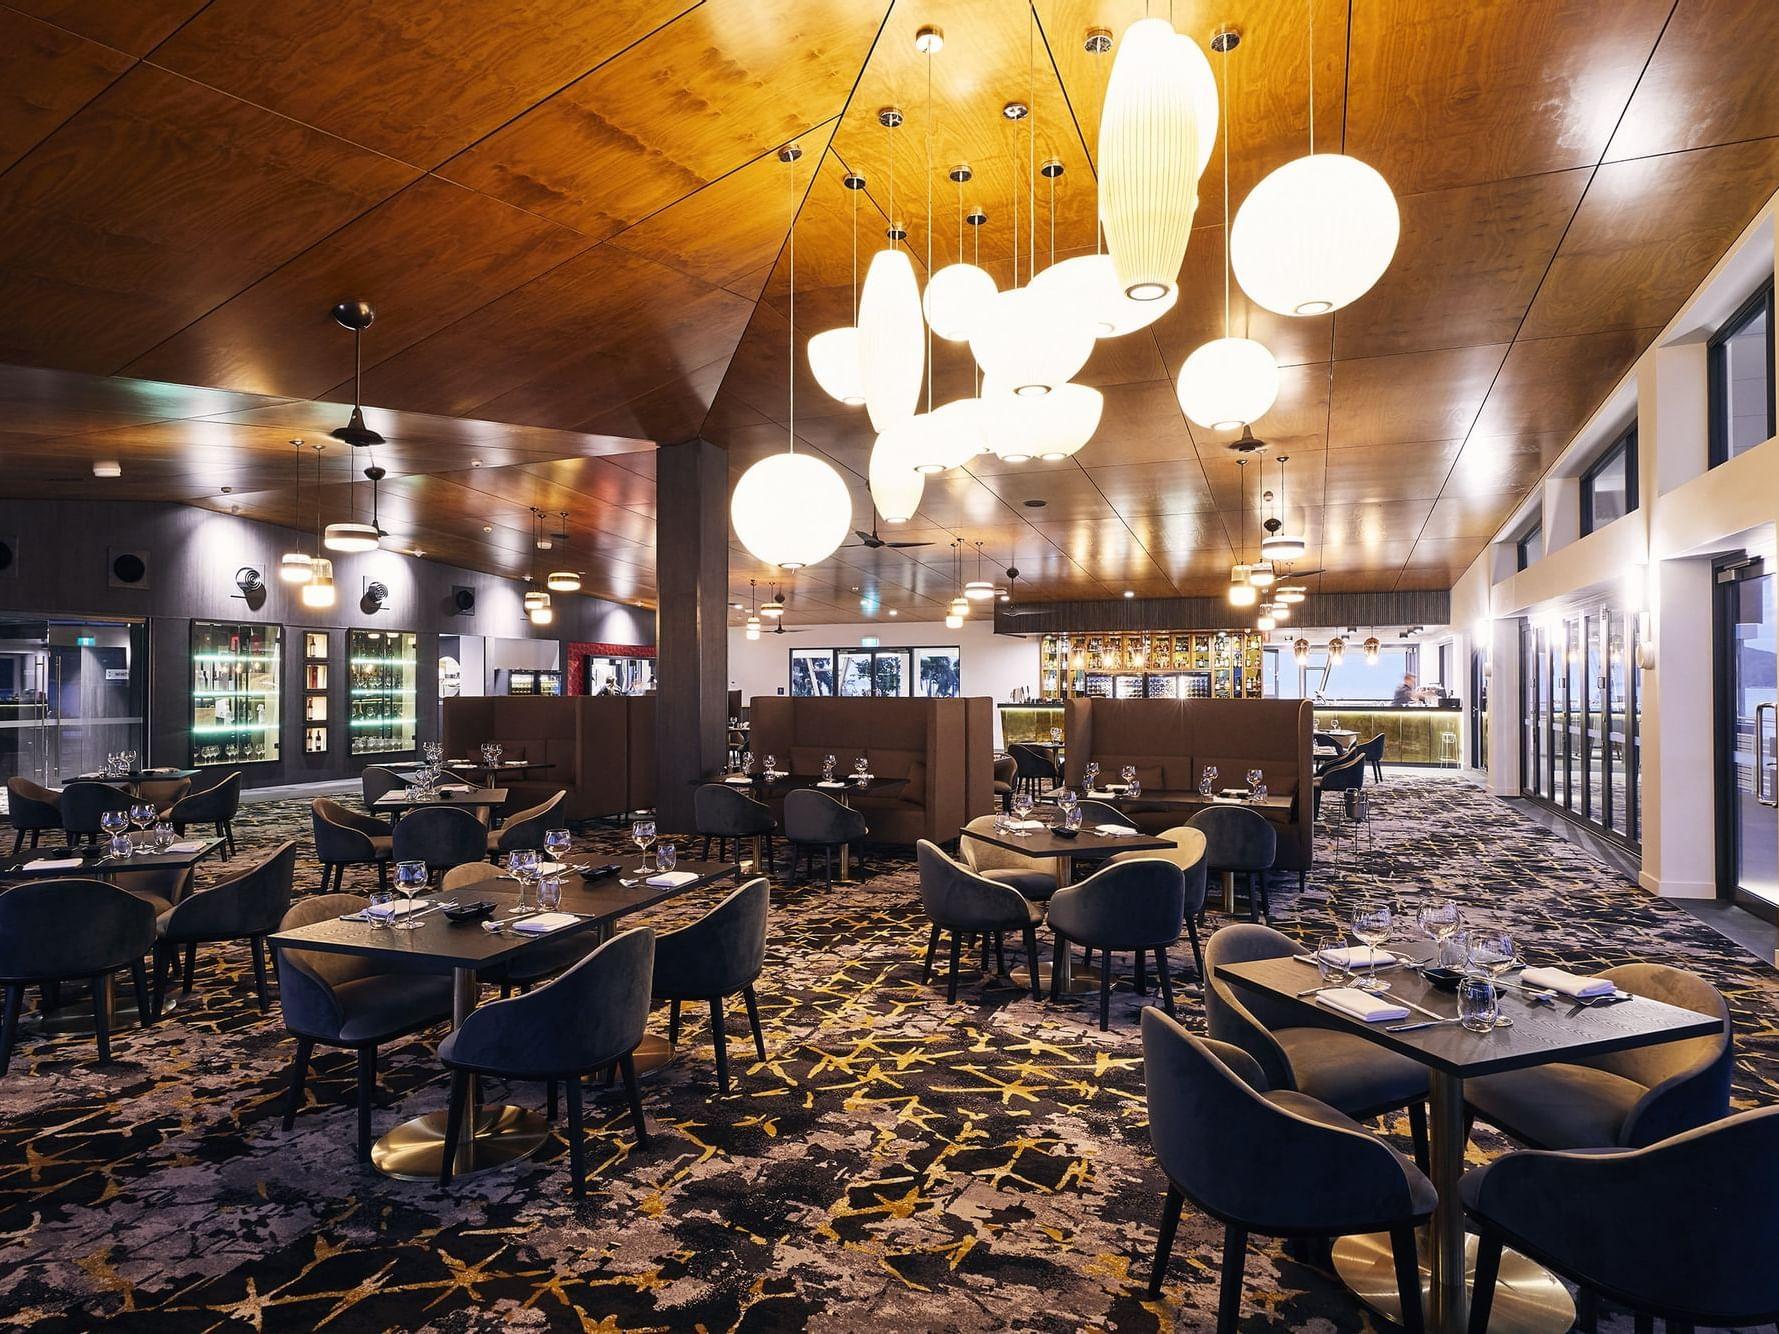 Lighted Infinity Restaurant at Daydream Island Resort